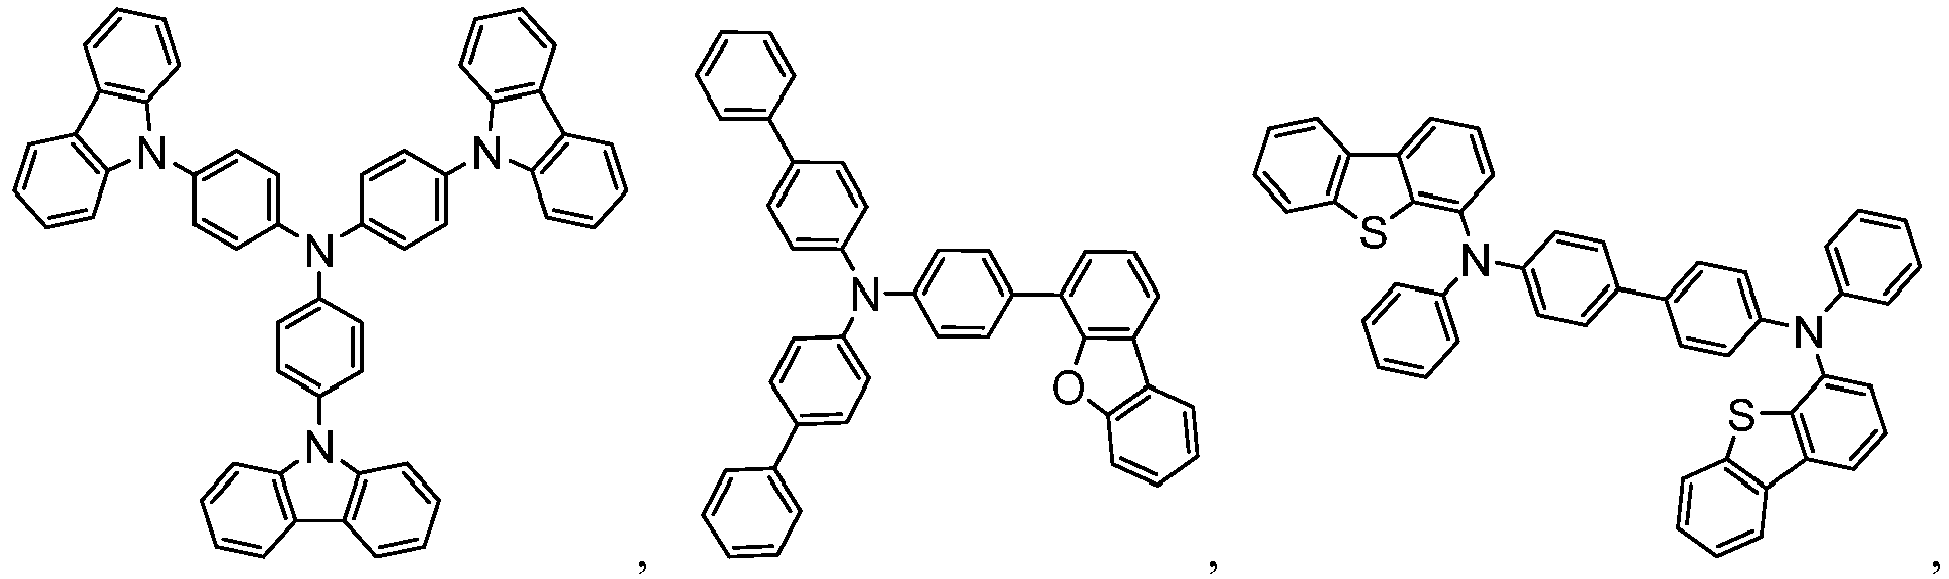 Figure imgb0870